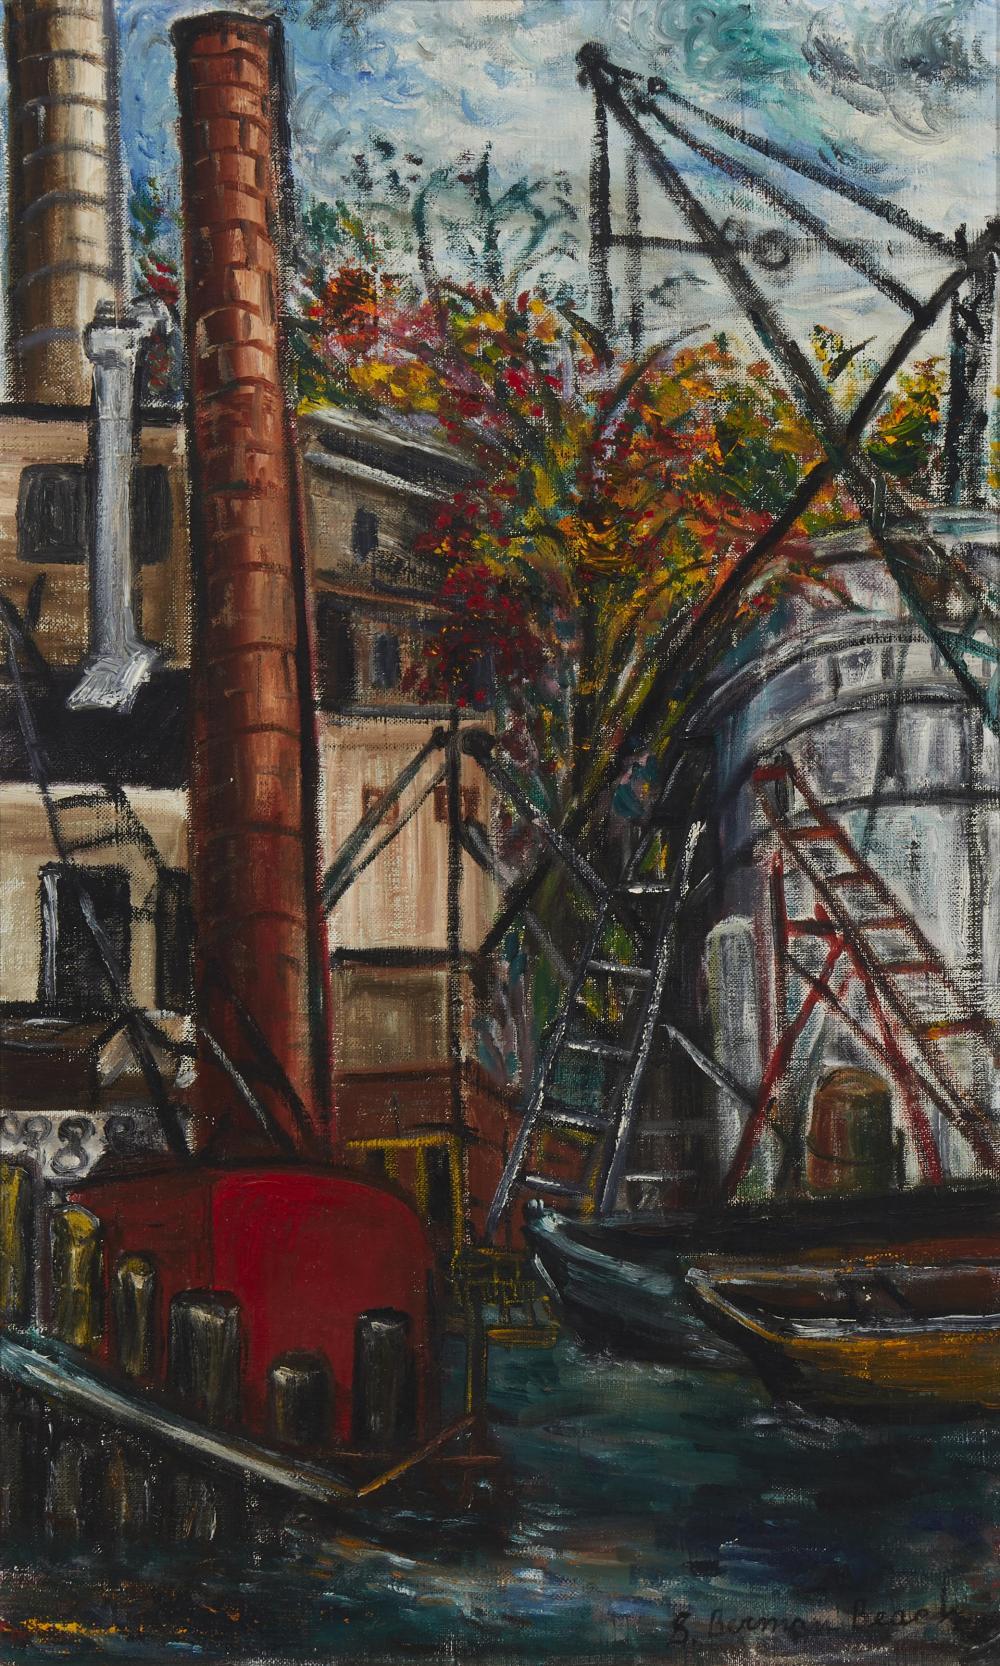 "Sara Berman Beach, (1890-1978, American), Boat yard with smoke stack, Oil on canvas, 26"" H x 16"" W"